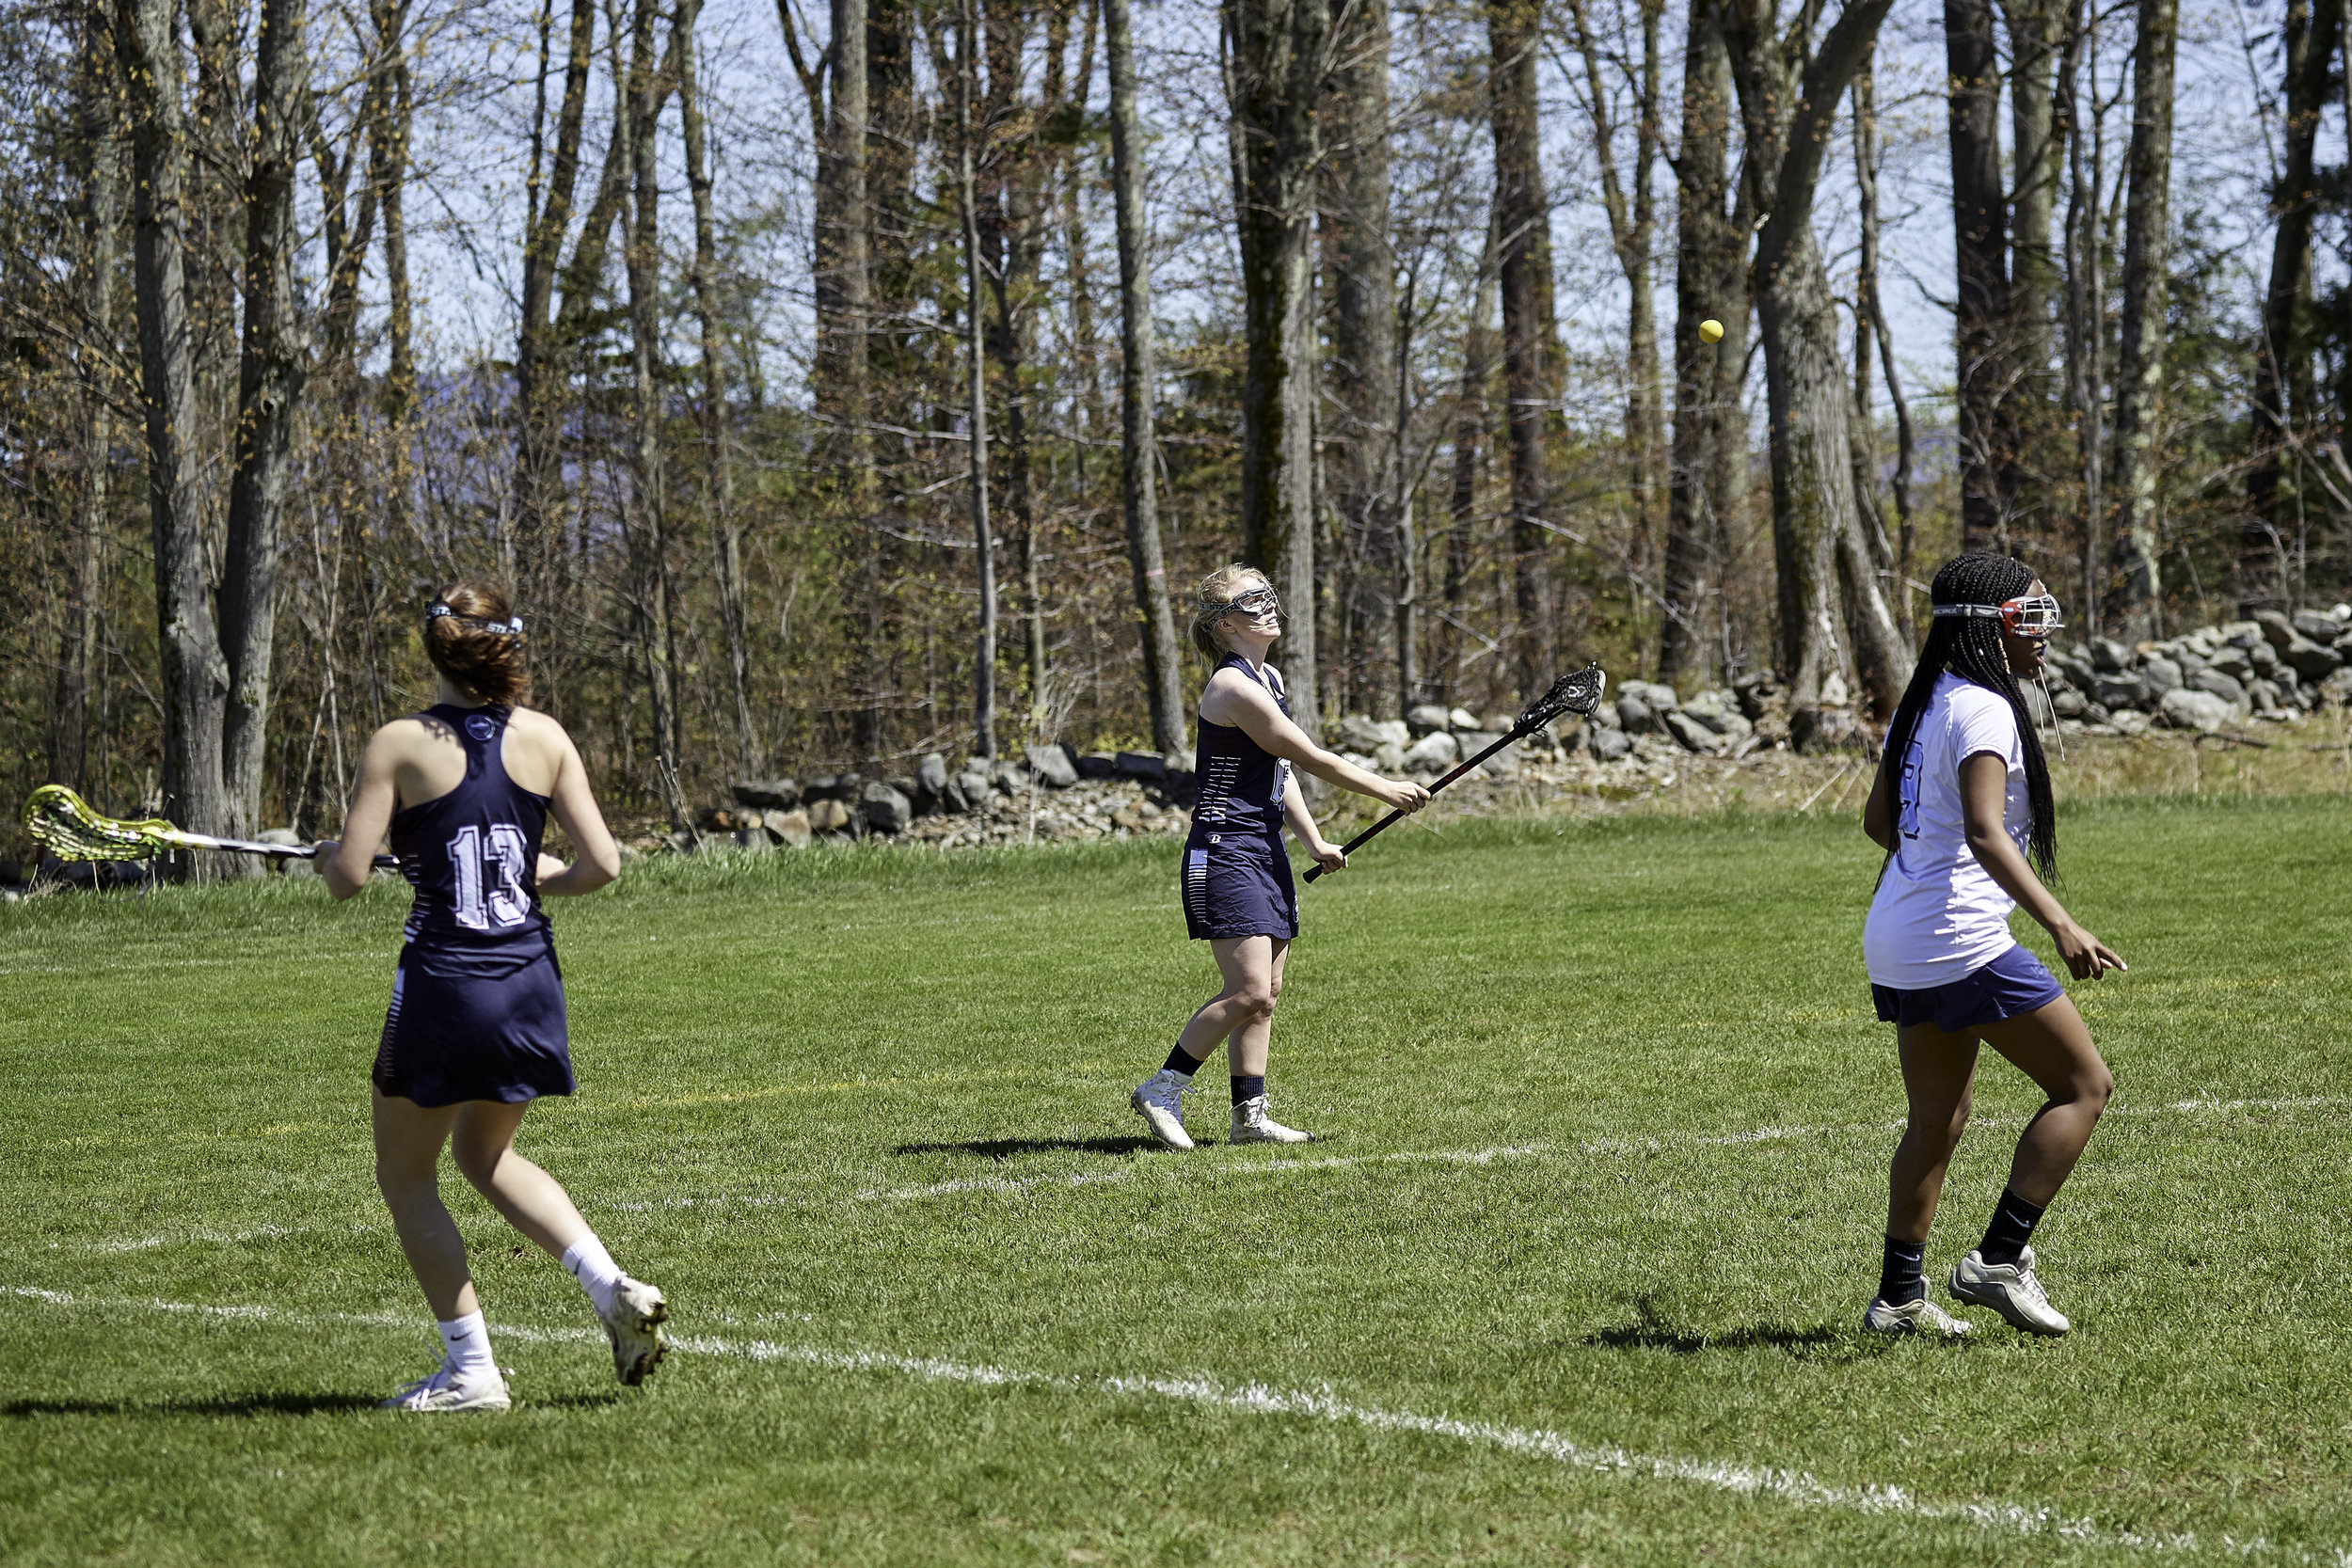 Girls Lacrosse vs. Stoneleigh Burnham School - May 11, 2019 - May 10, 2019193180.jpg